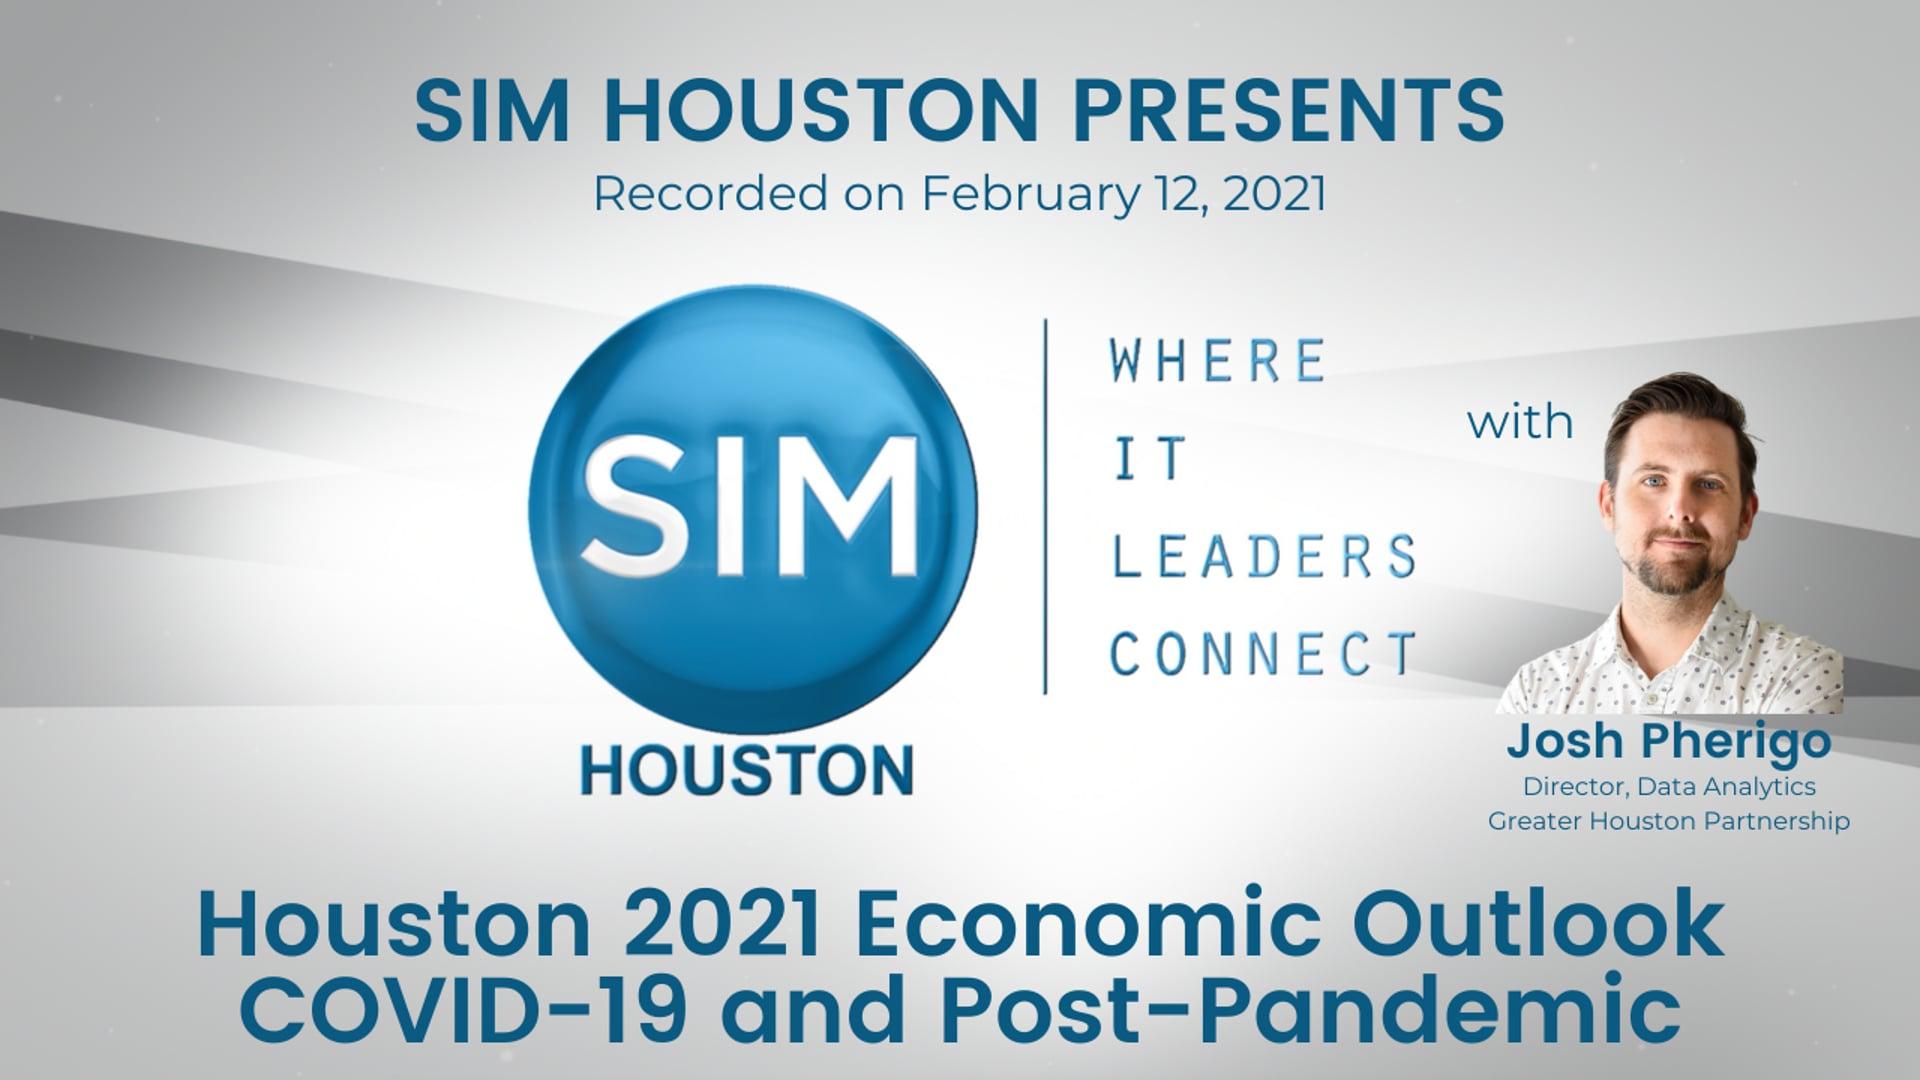 SIM Houston Presents Houston 2021 Economic Outlook COVID-19 and Post-Pandemic with Josh Pherigo